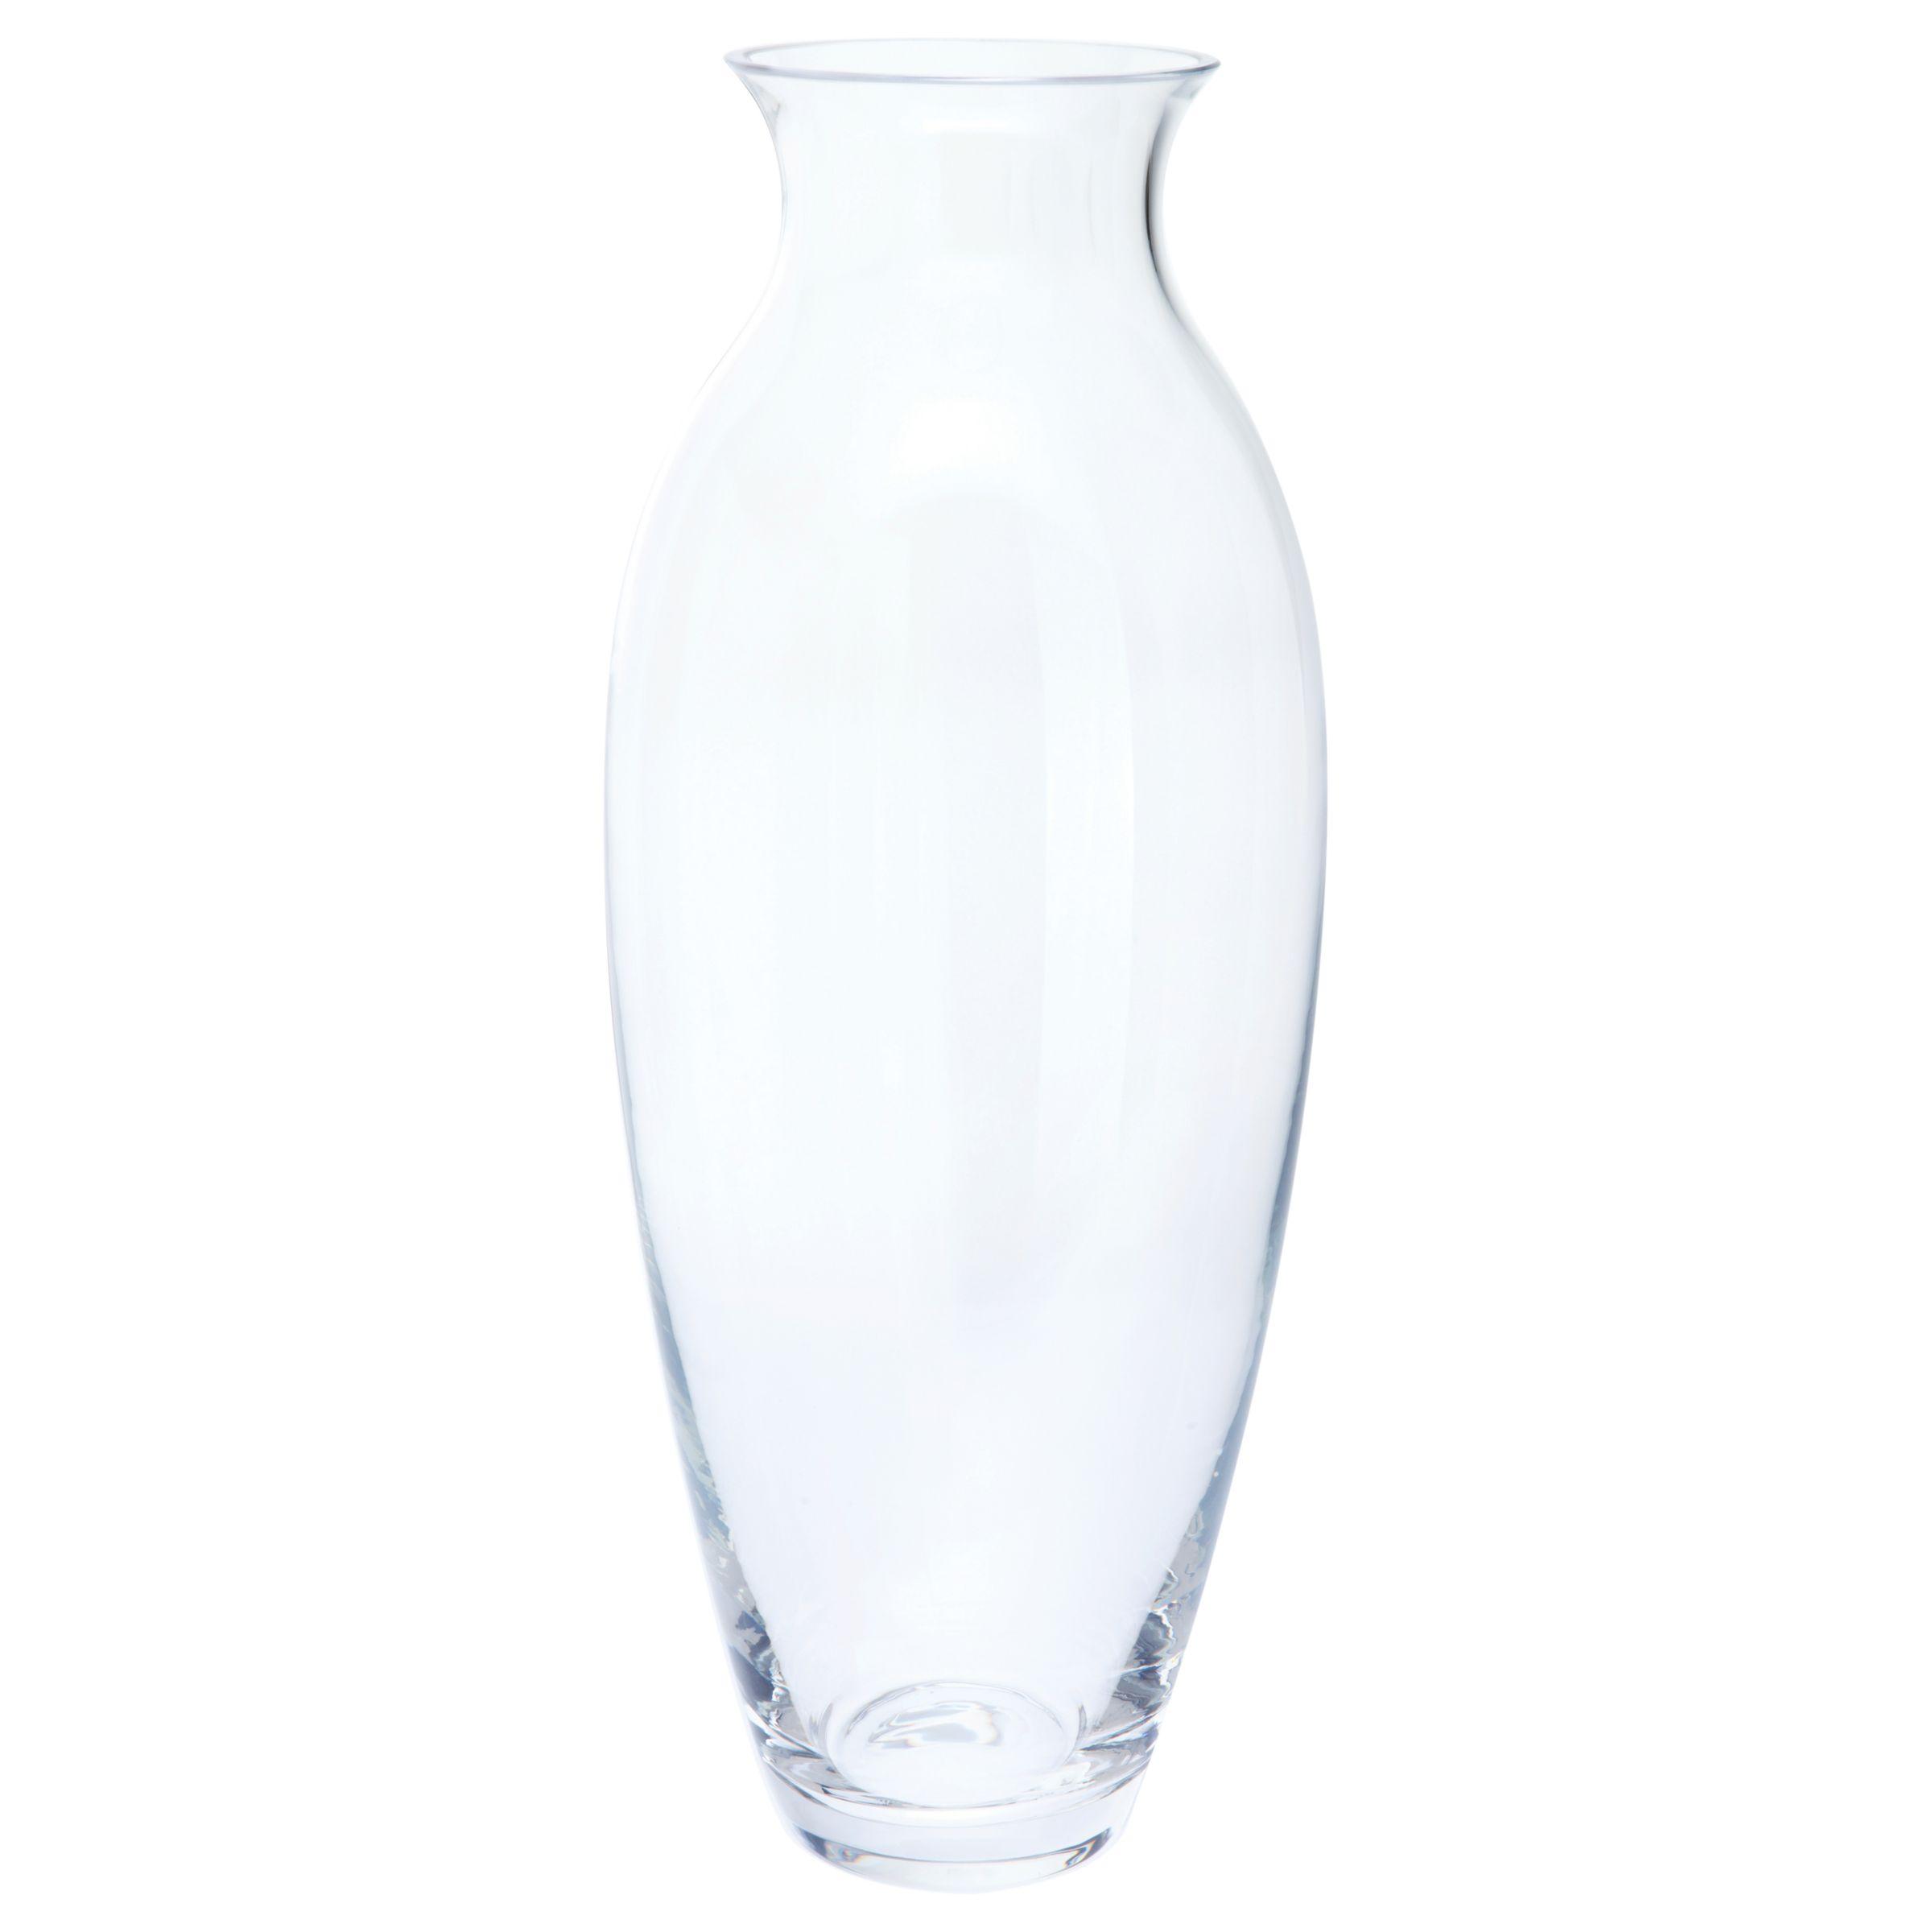 Dartington Crystal Dartington Crystal Tara Large Vase, Clear